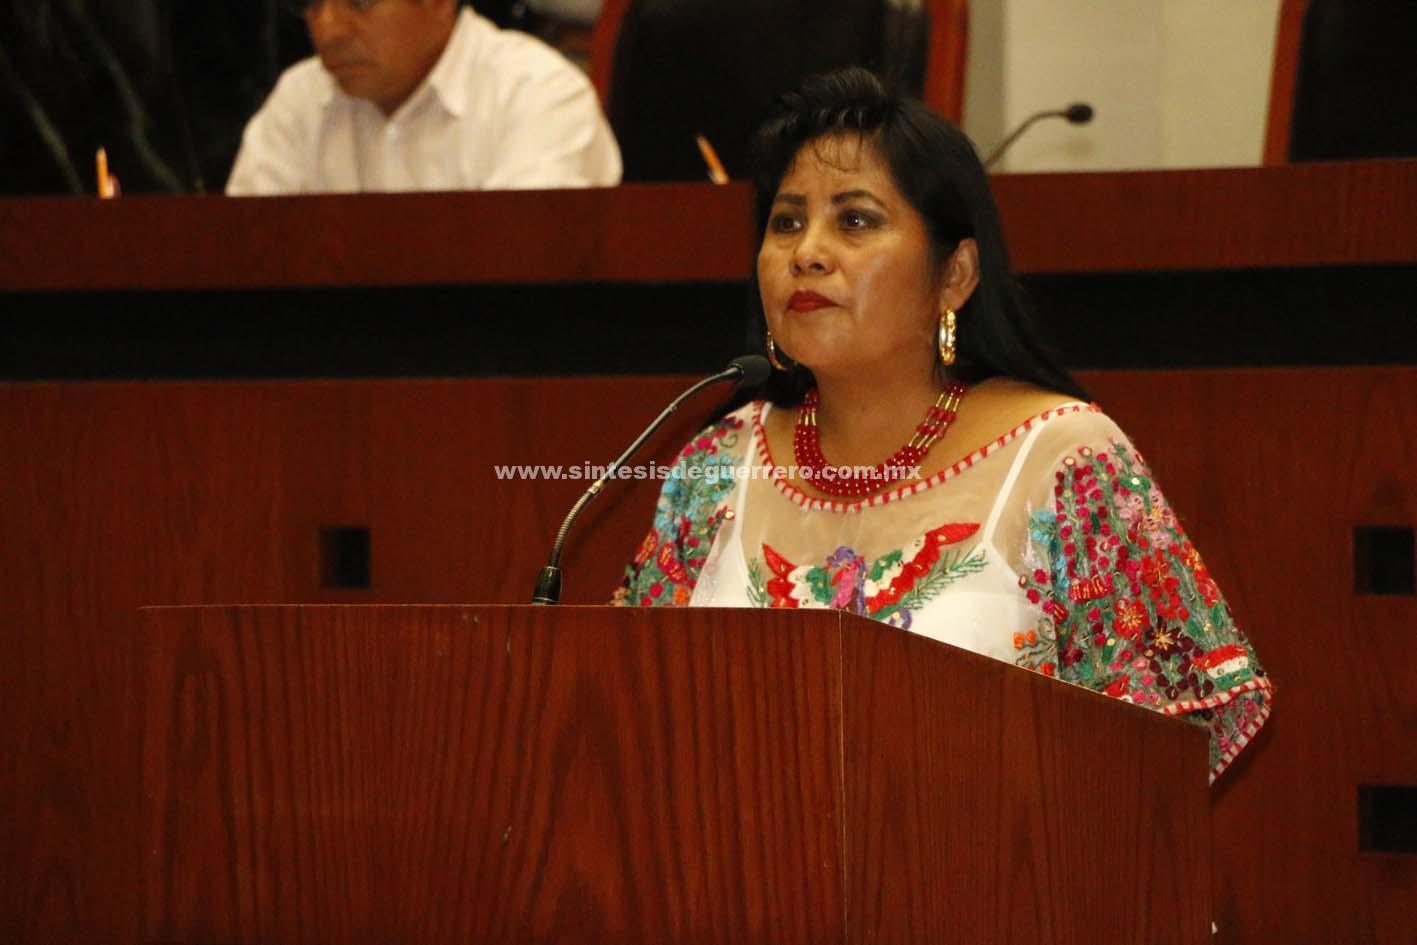 Congreso local exhortó a las autoridades educativas a implementar mecanismos para fortalecer los programas de alfabetización